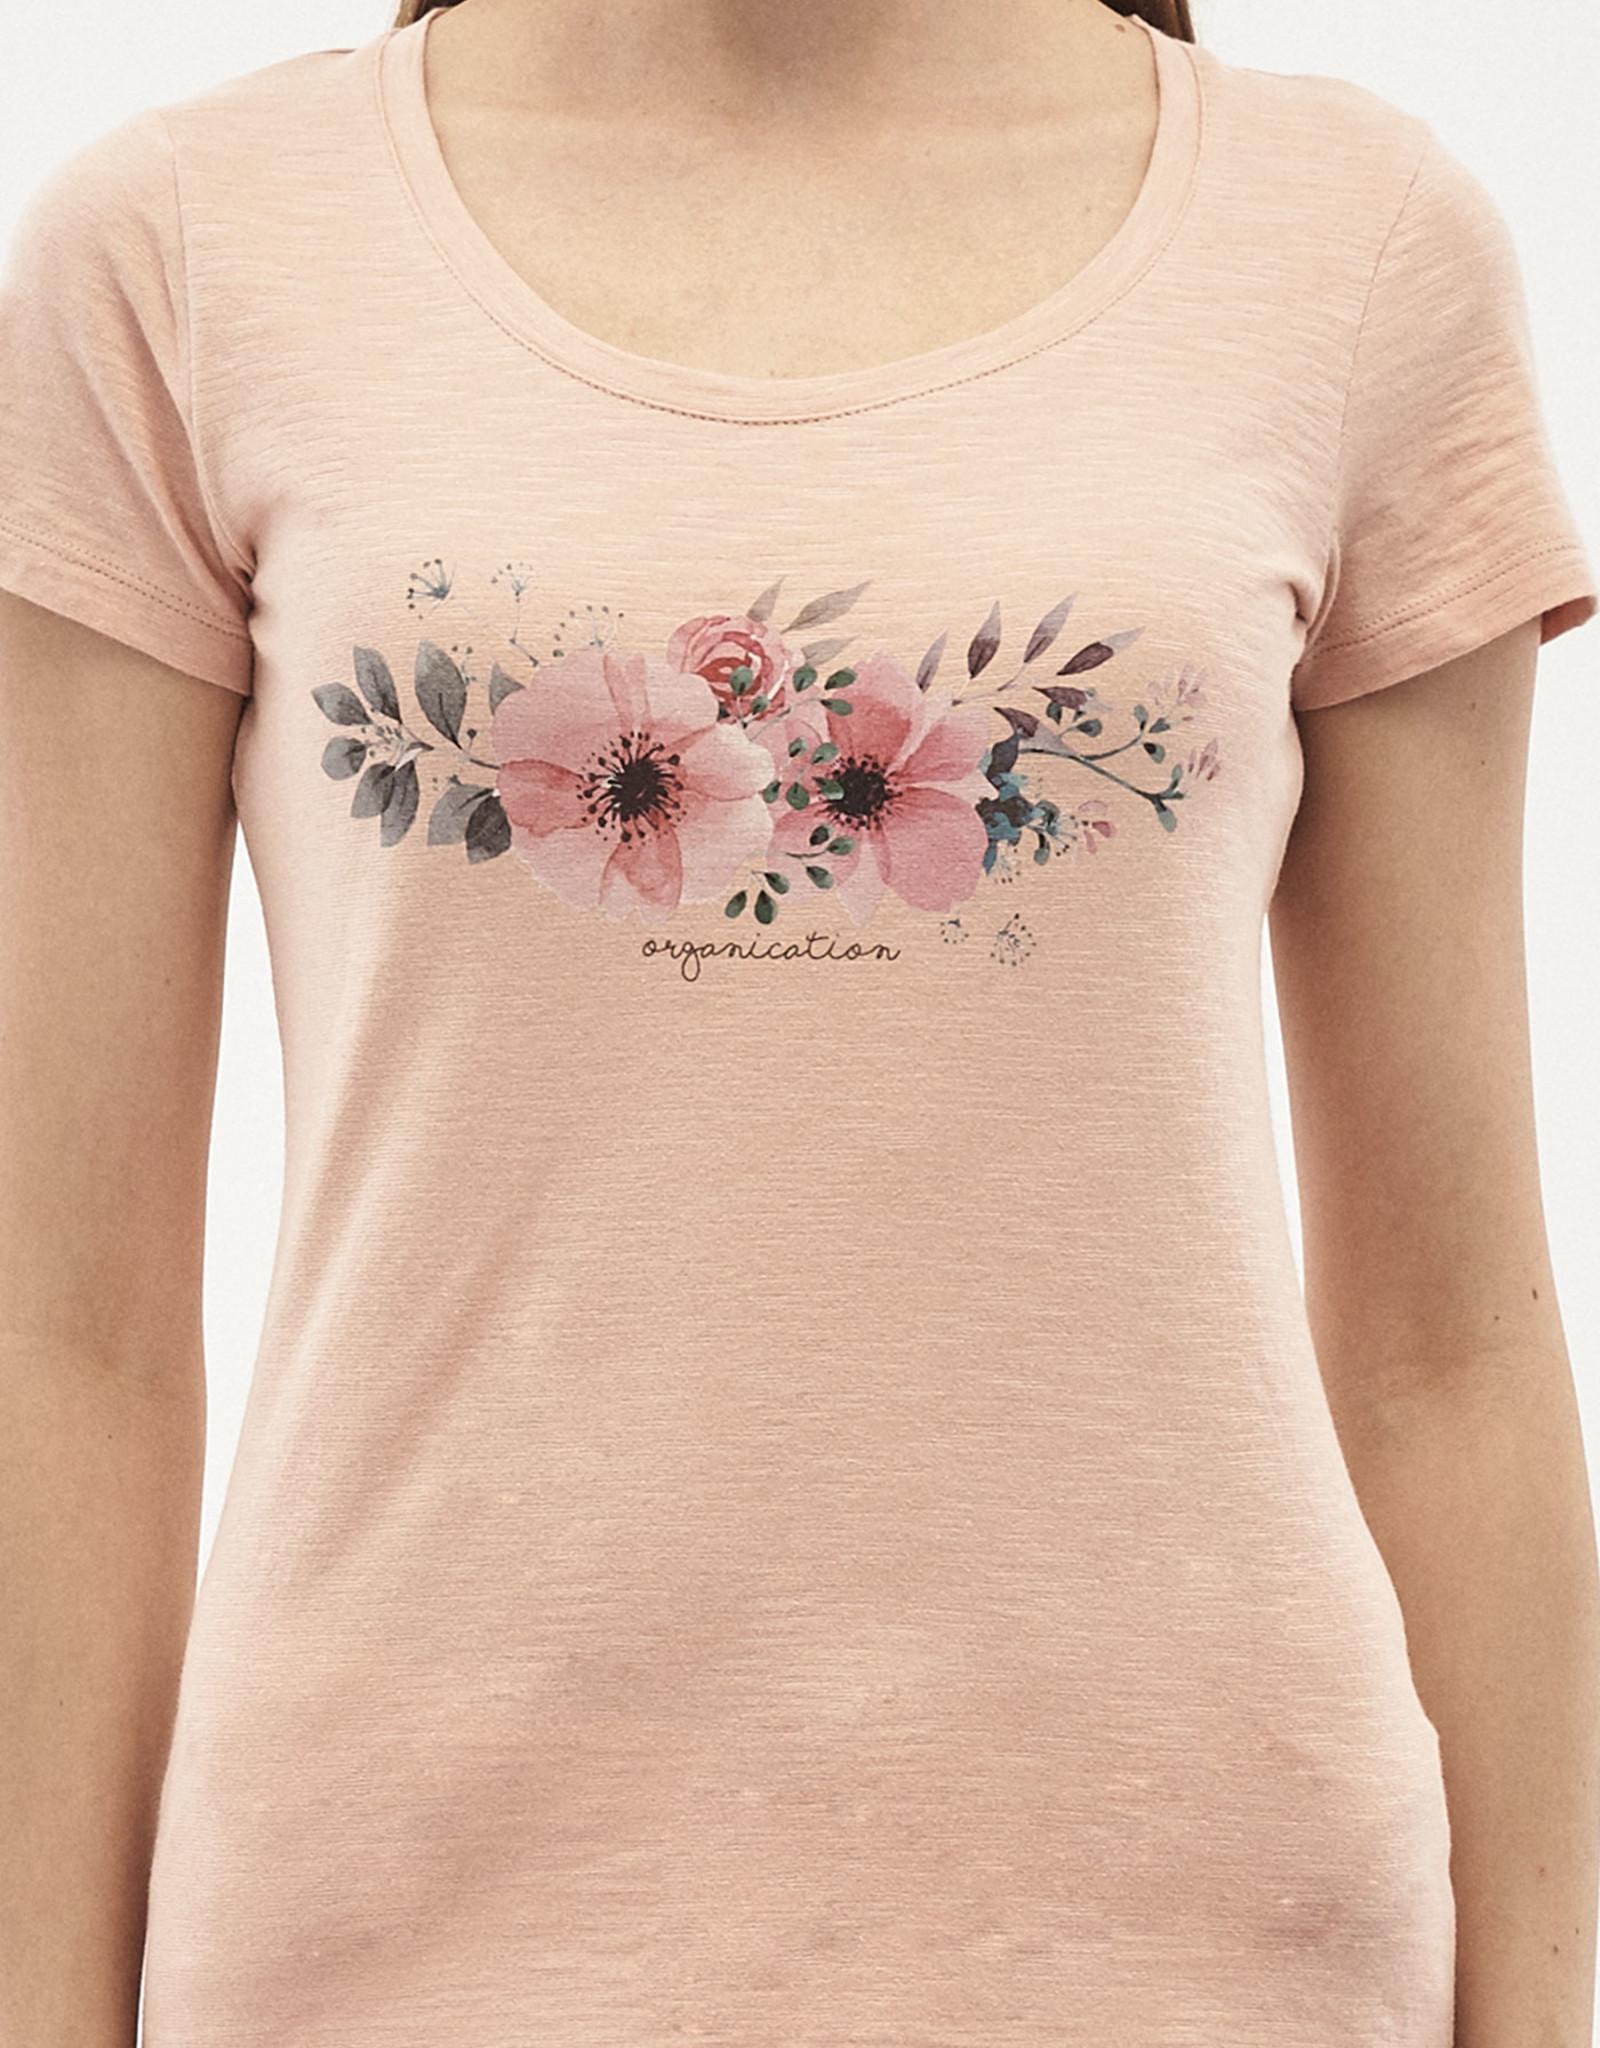 Organication T-SHIRT PRINT FLOWERS ROSE PINK SAND